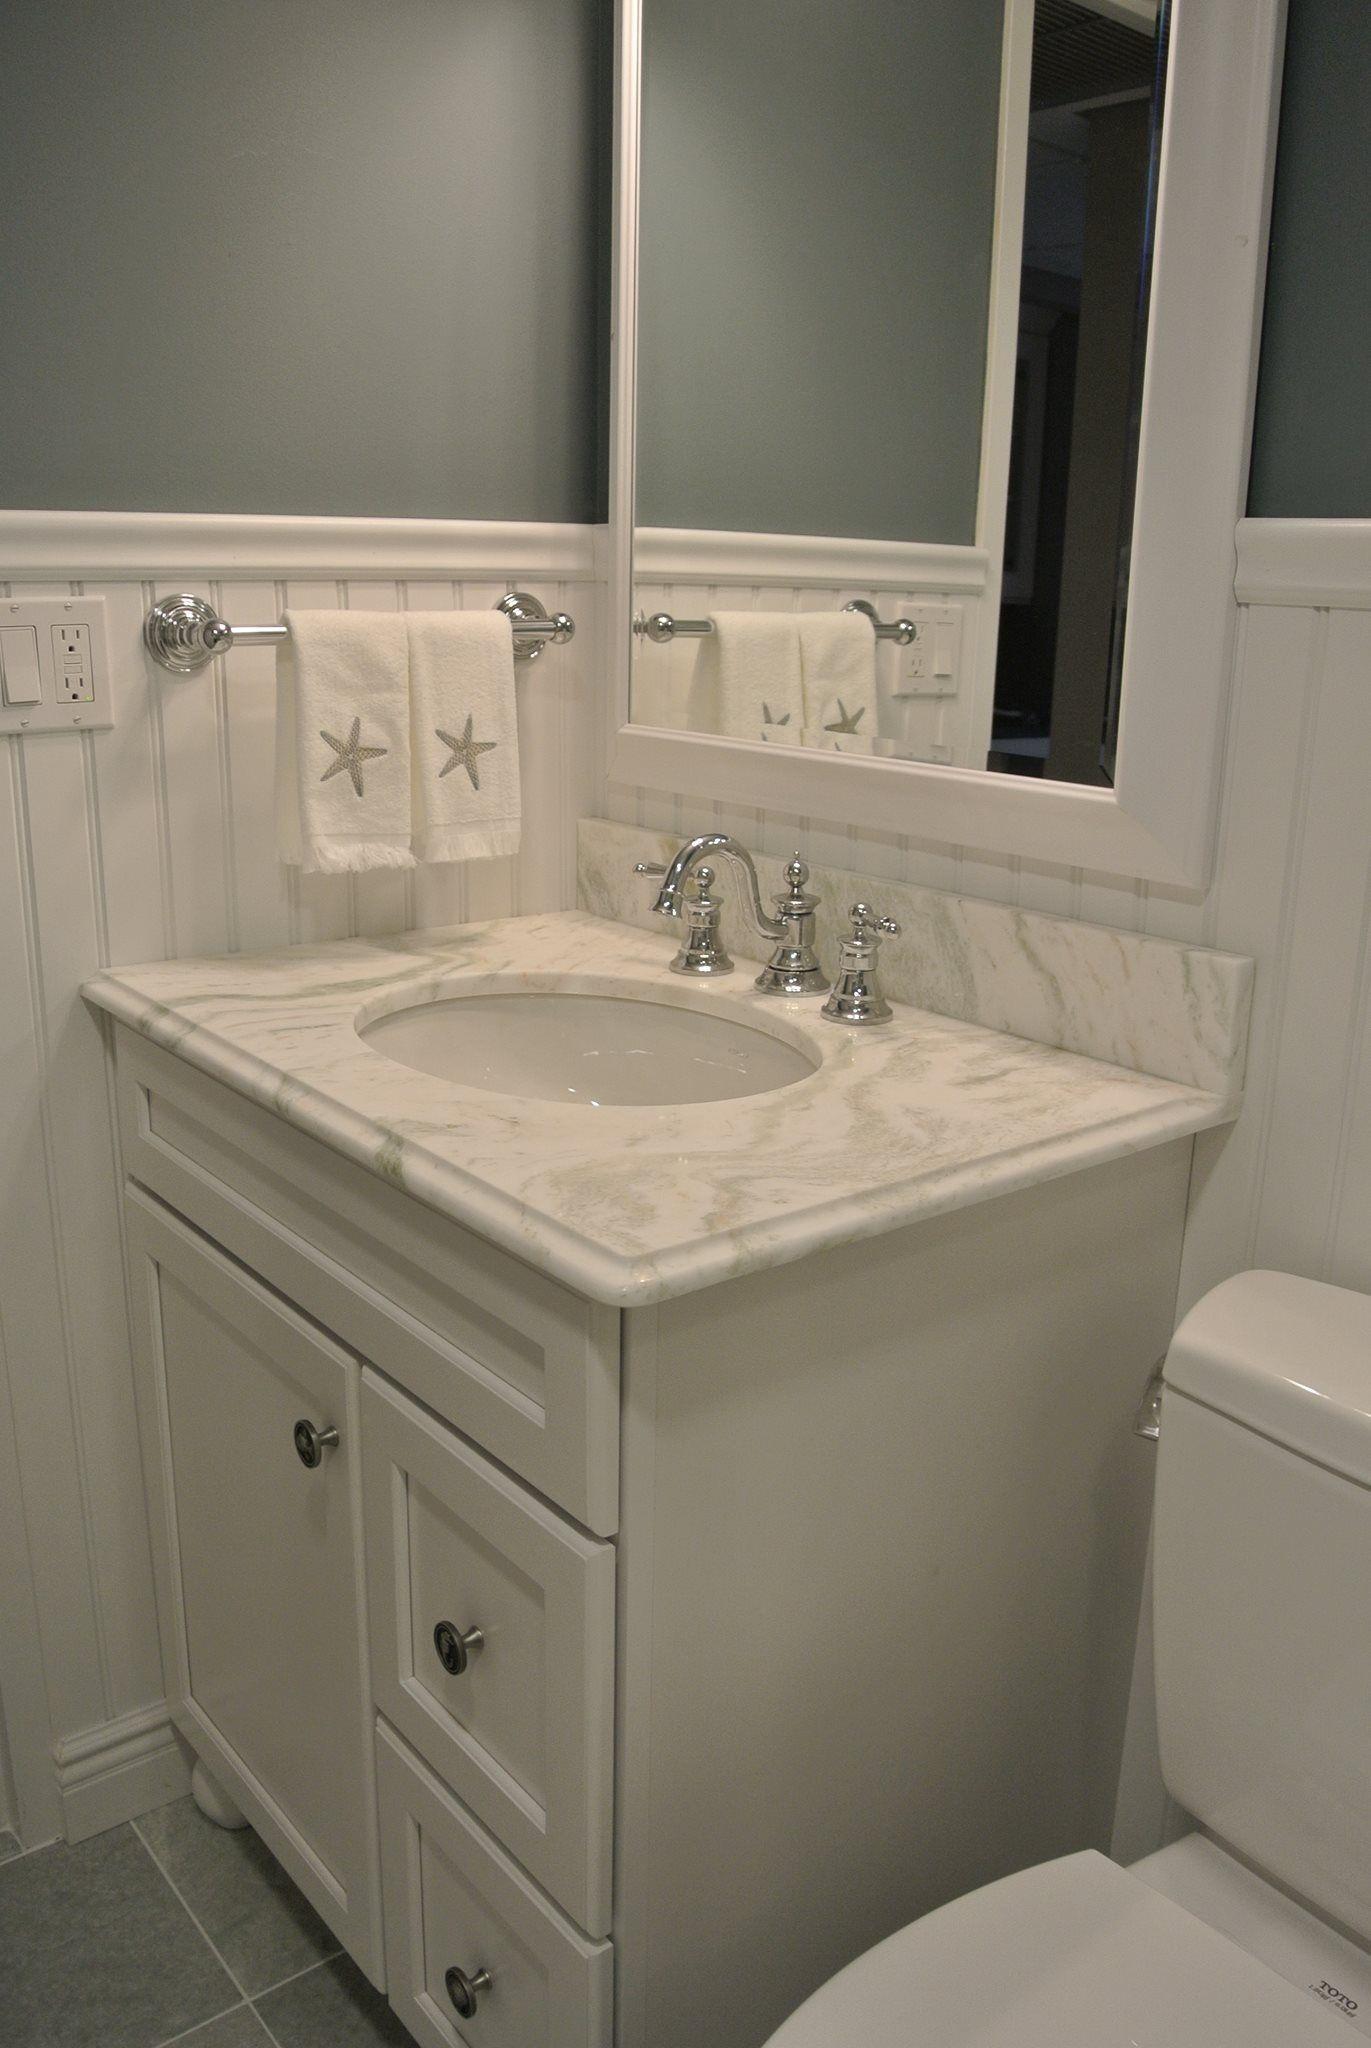 Stunning Craftsman Bathroom Design Ideas Pedestal Sink - Bathroom stuff for small bathroom ideas